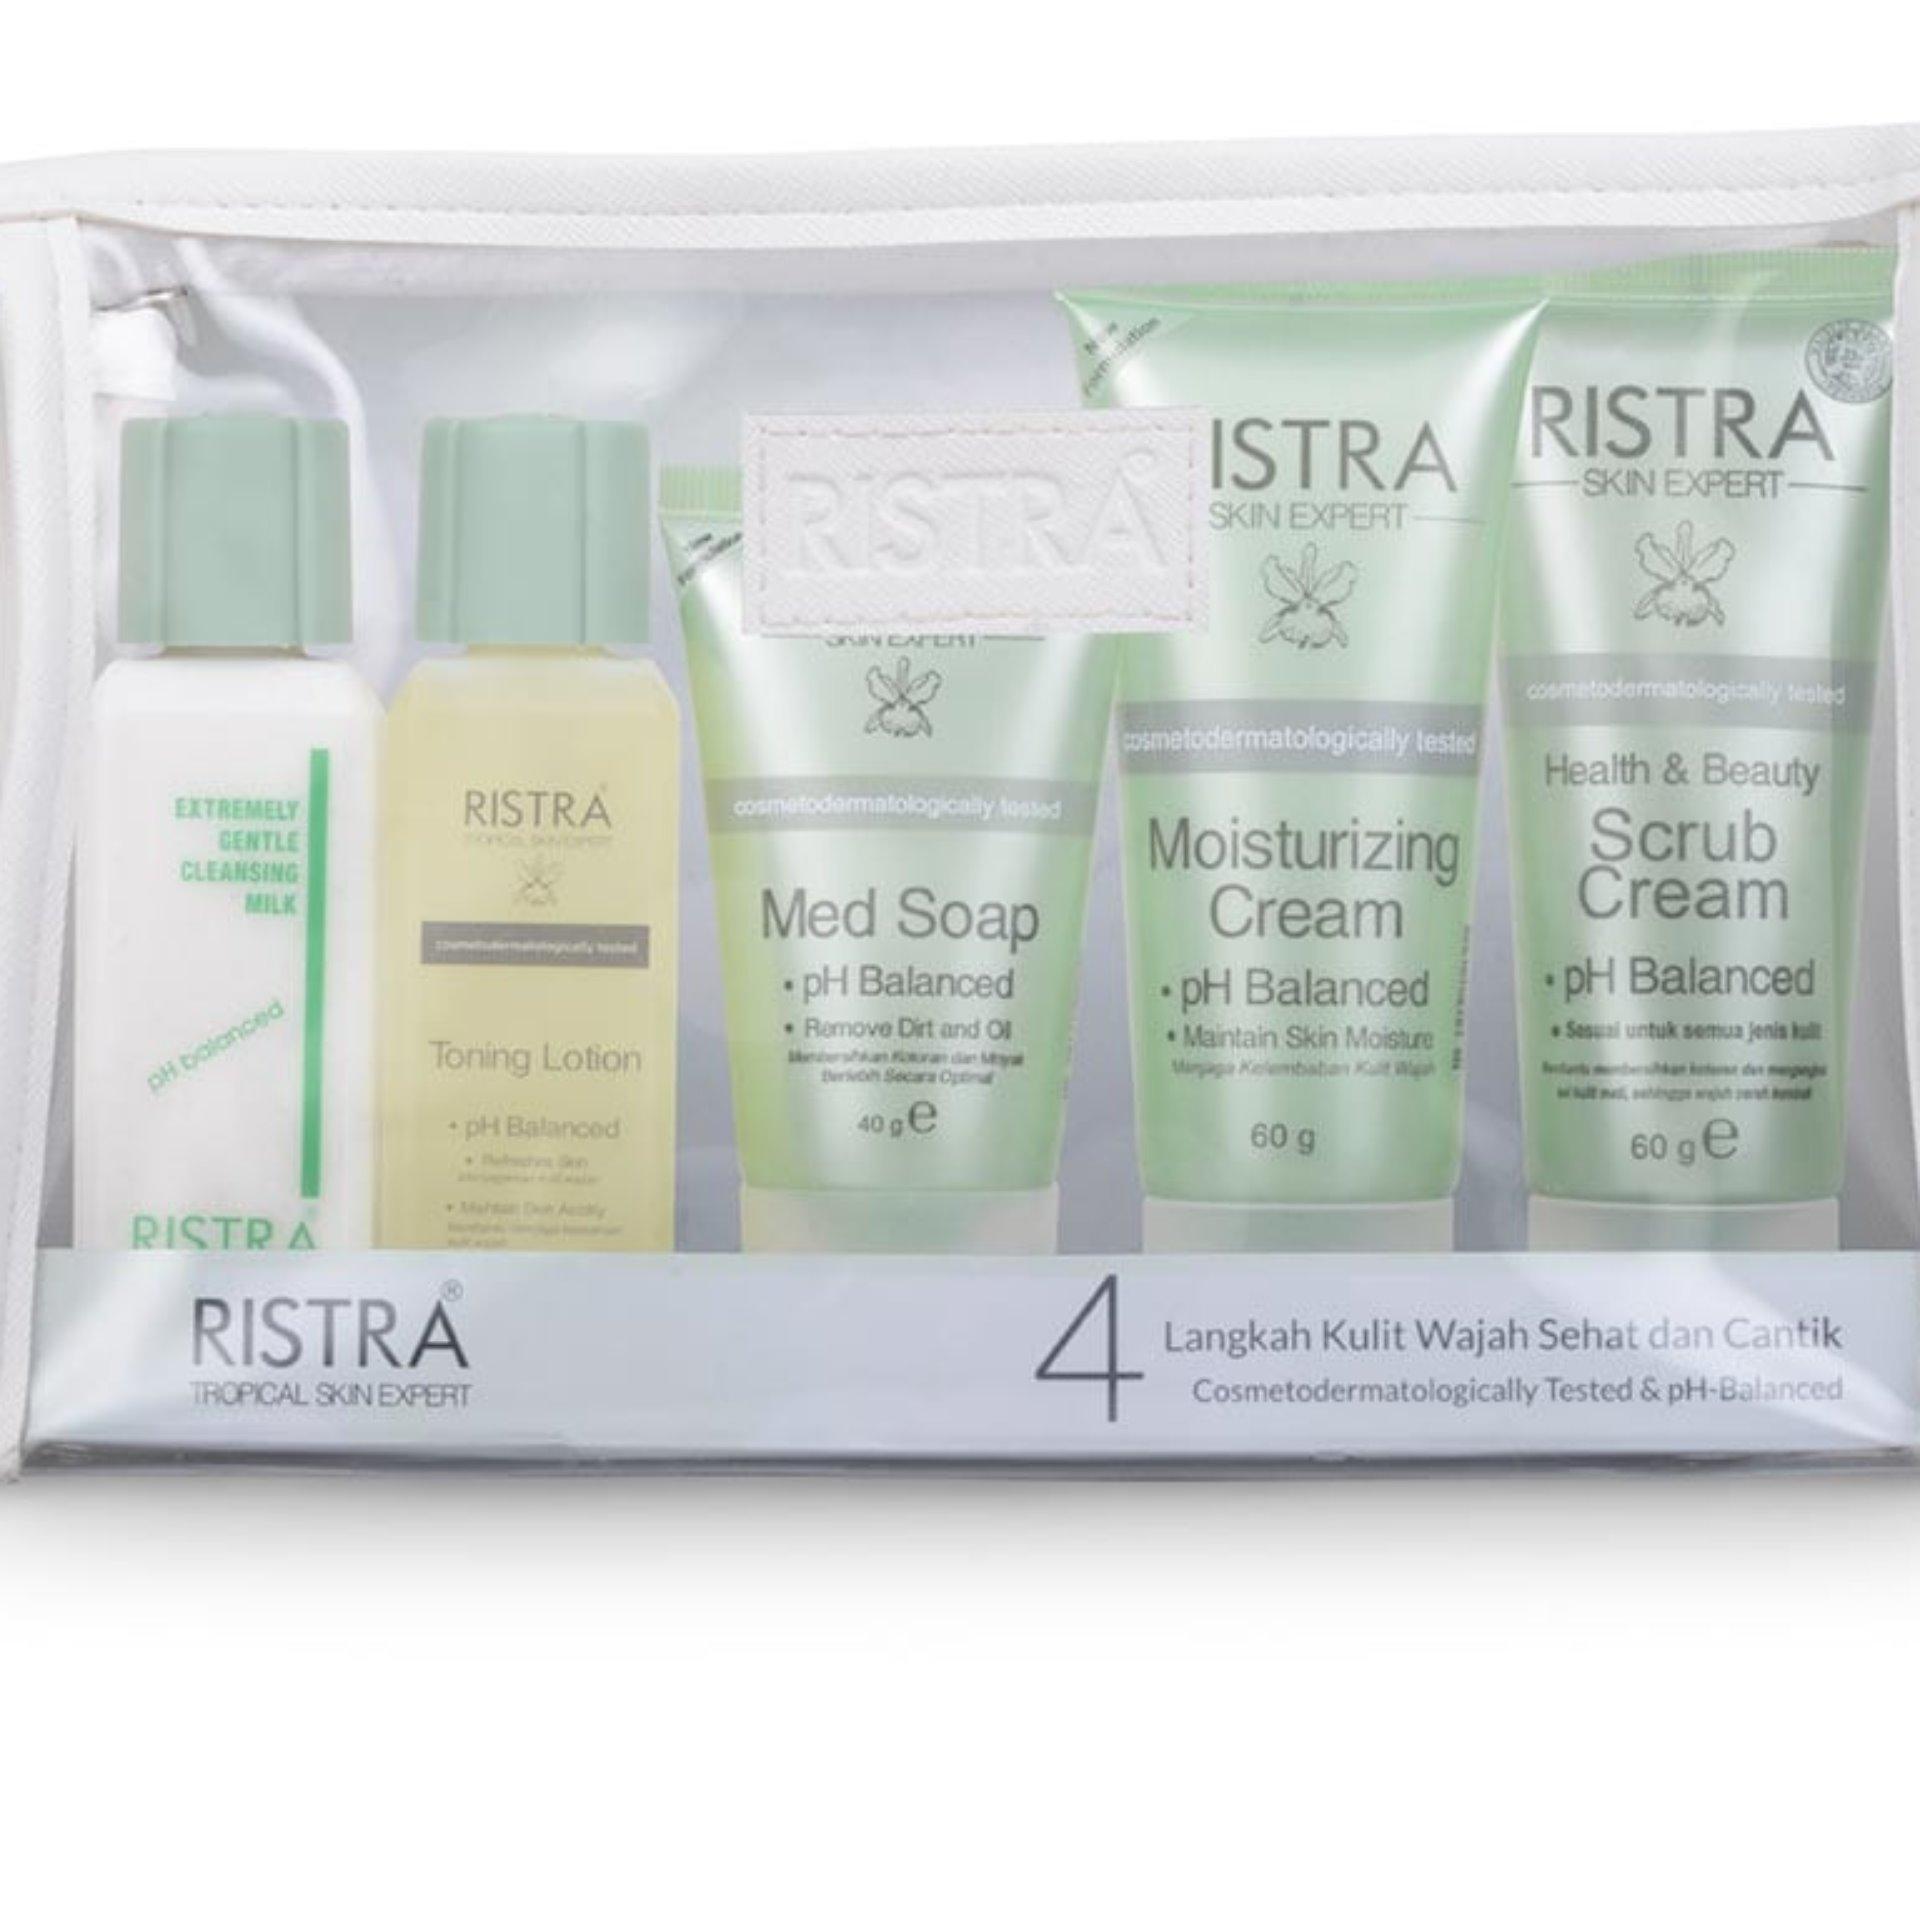 Pencarian Termurah Ristra Travel Kit Plus Suncare 40gr Toning Lotion Botol 150 Ml Cleansing Beauty Med Soap